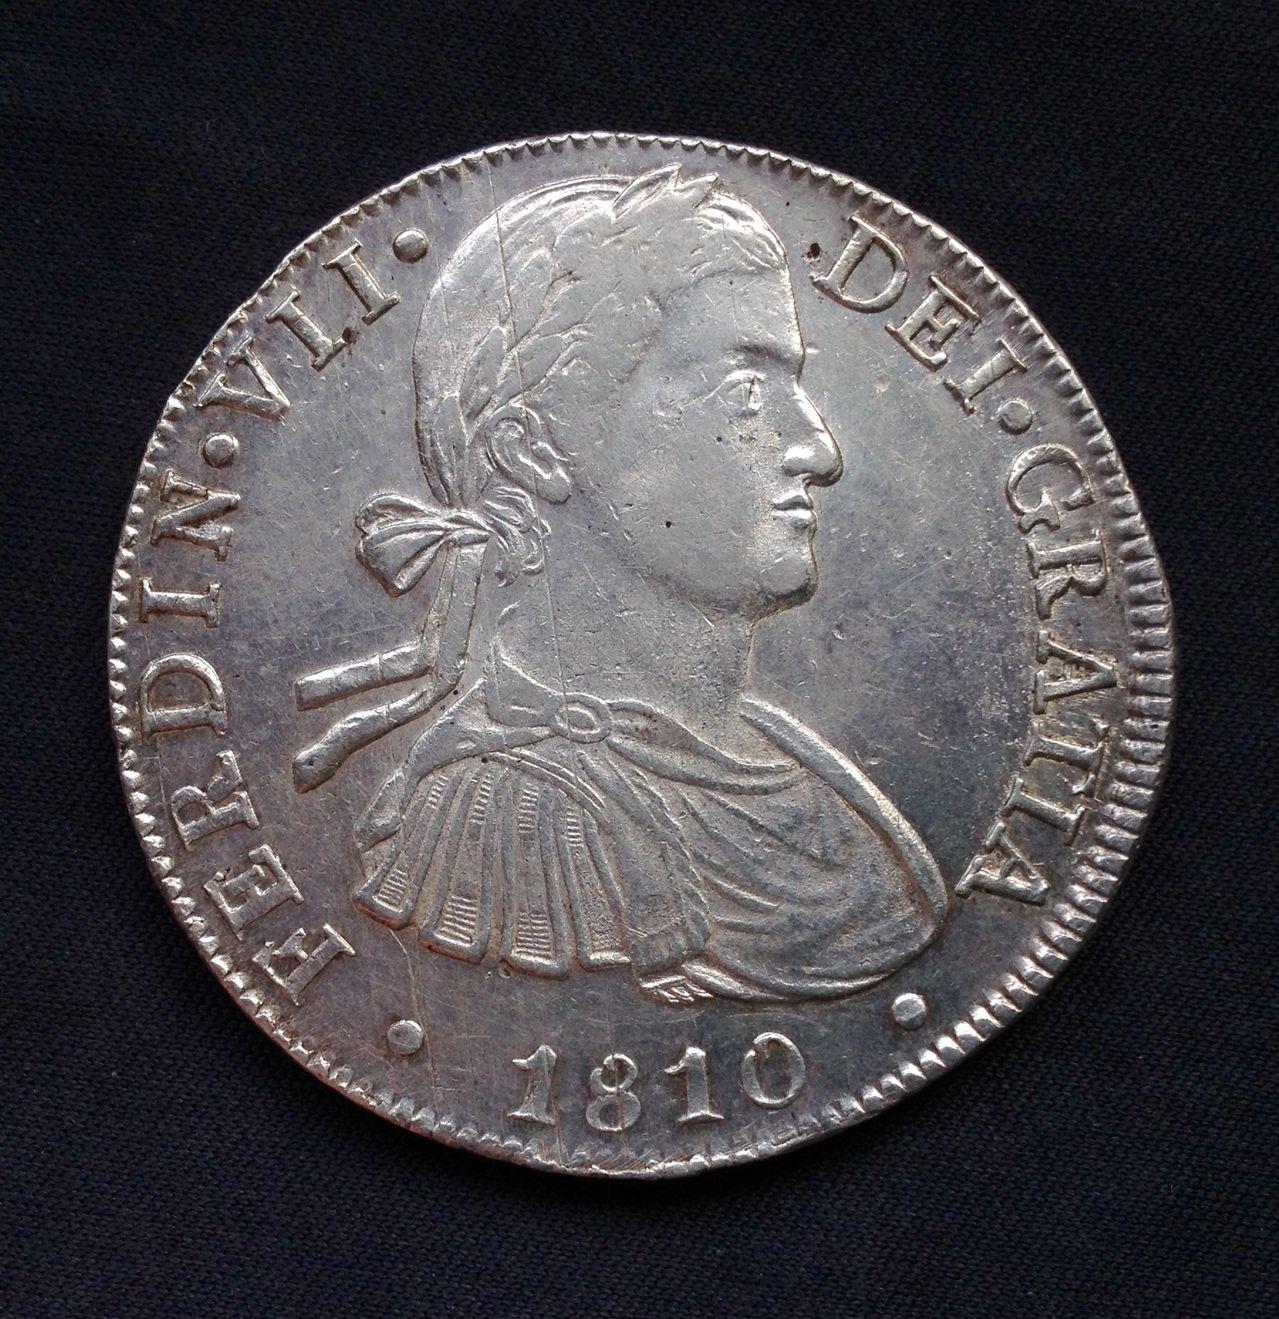 8 reales 1810 MO-HJ Busto Imaginario. Fernando VII - Anmem dedit. Image